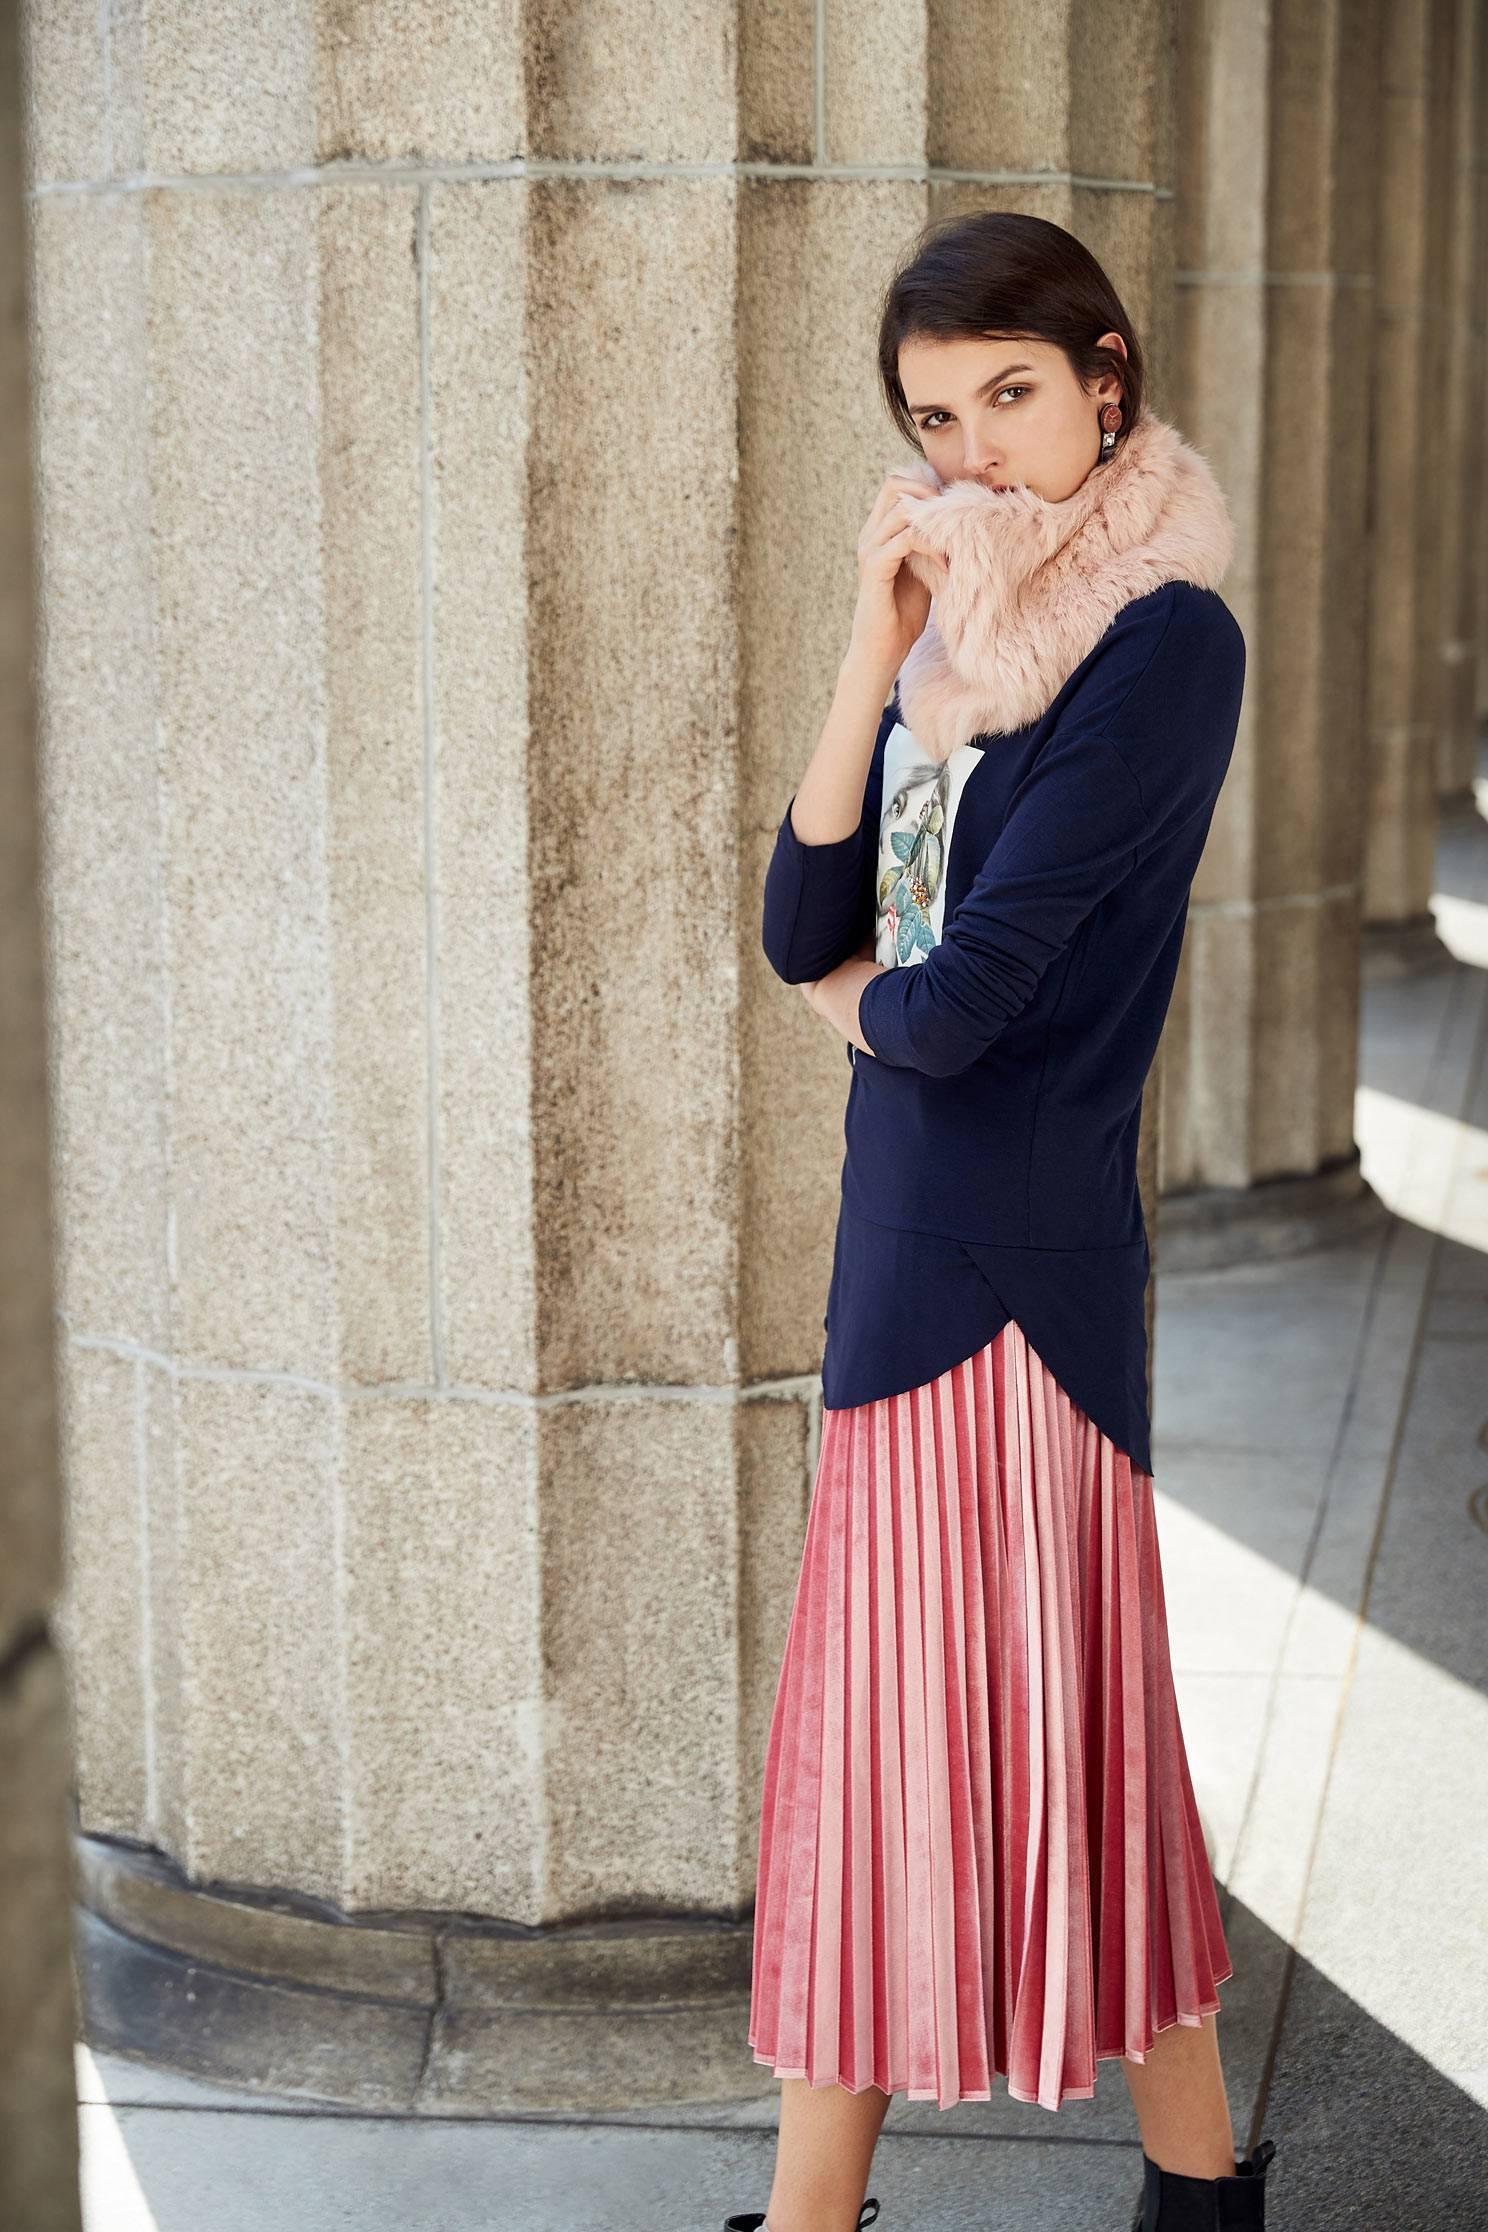 Pleated skirt with pink color,pleats,pleatedskirt,maxipleatedskirt,longskirt